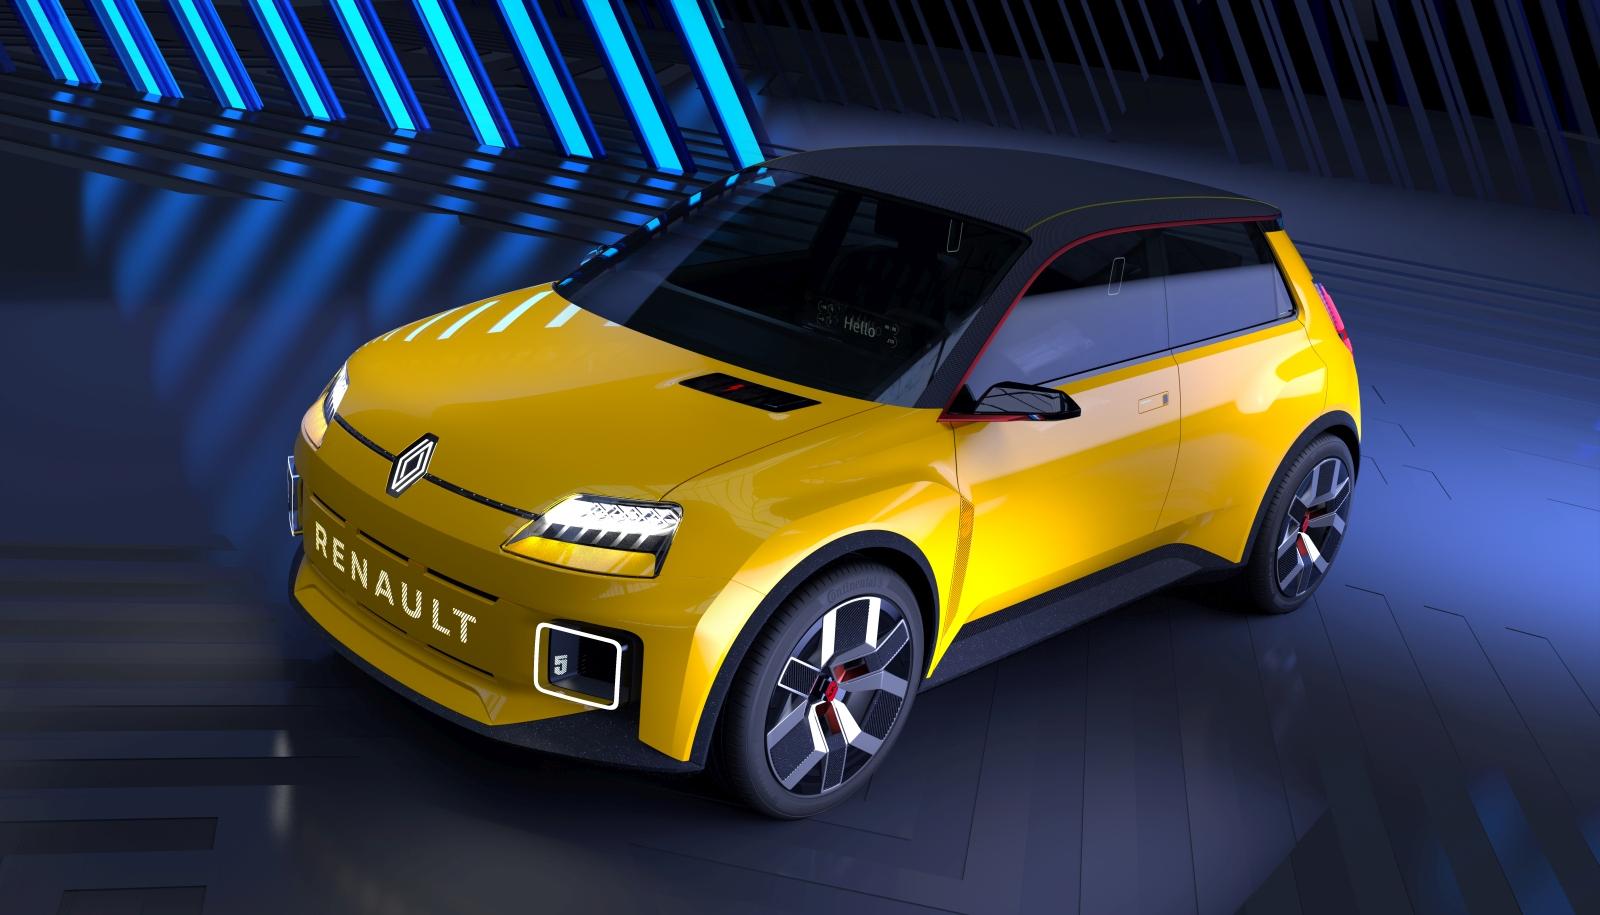 Renault5Prototype9hr0014012021(4)